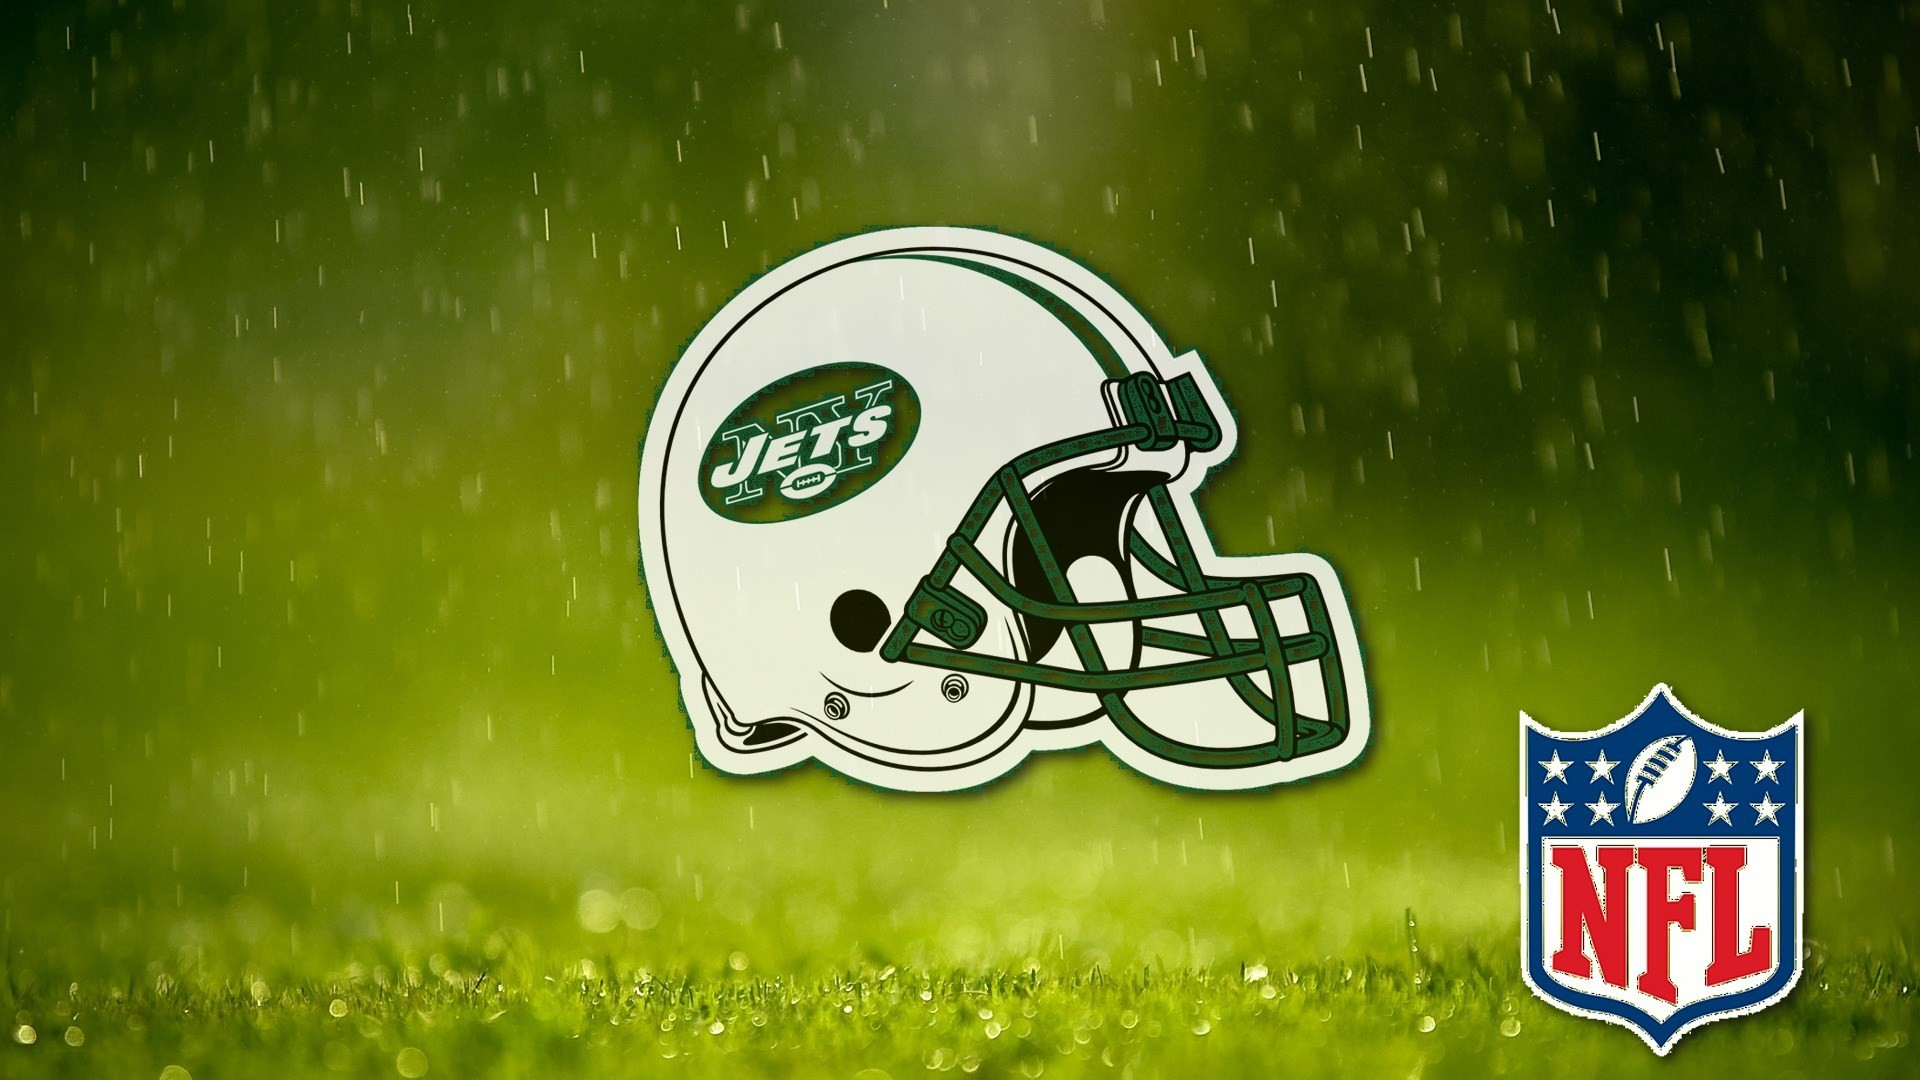 nfl ny jets helmet on field grass wallpapers 1920×1080